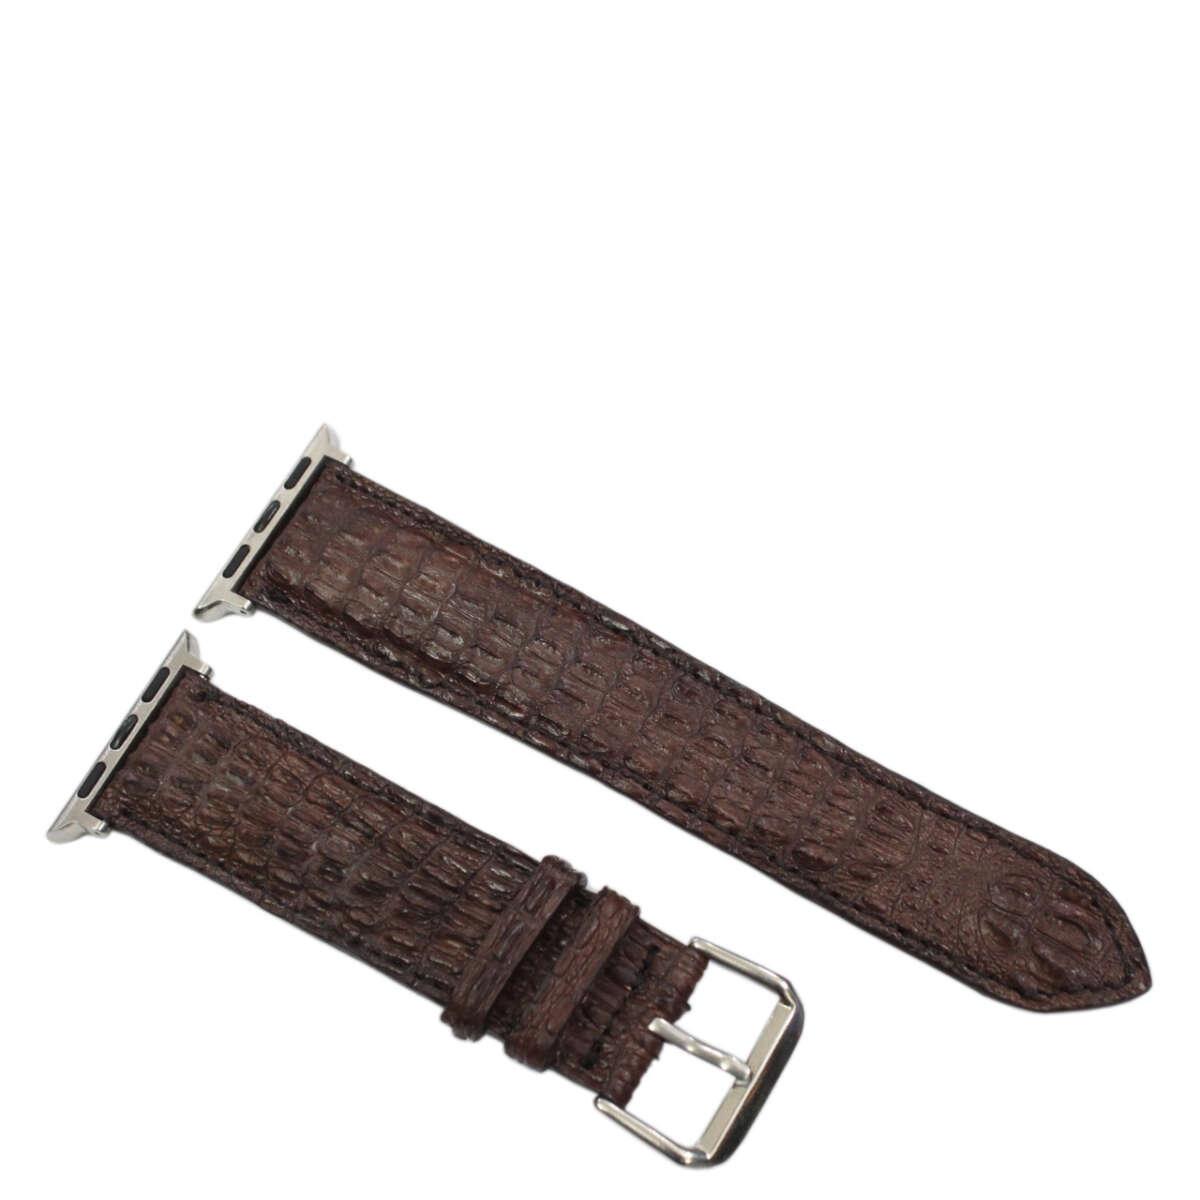 Dây da cá sấu Apple Watch S951a